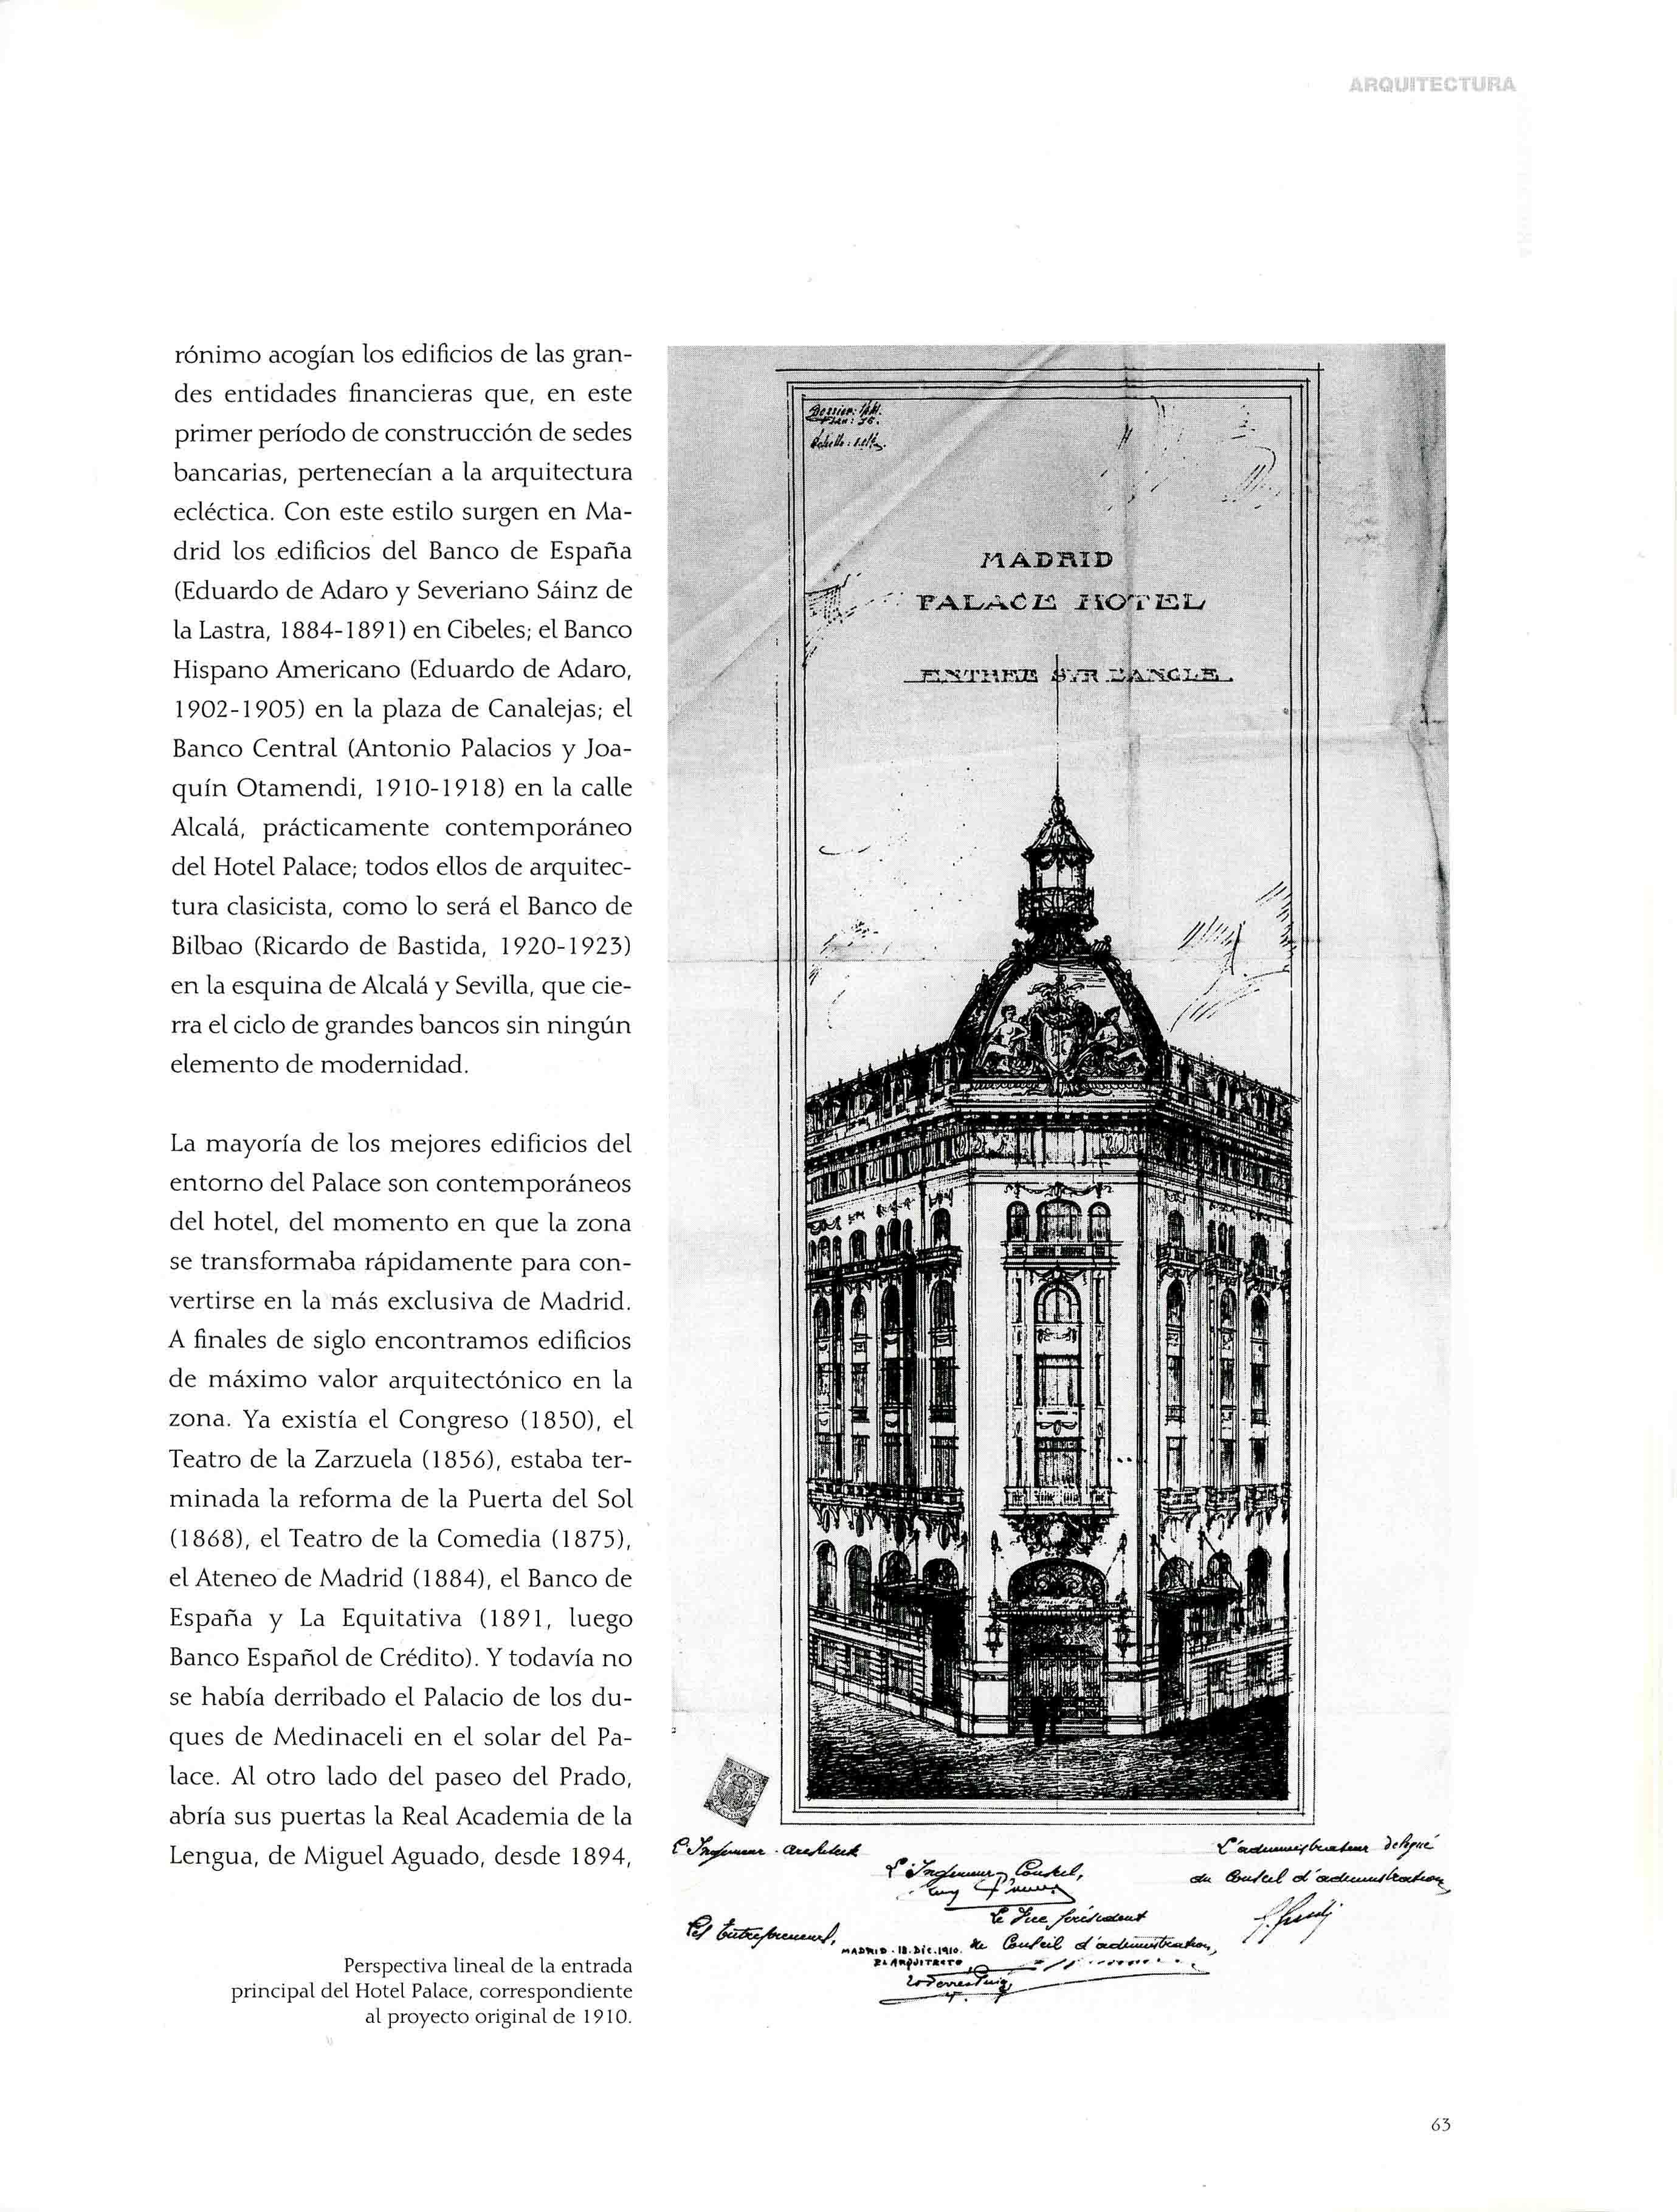 PalaceHotel 106